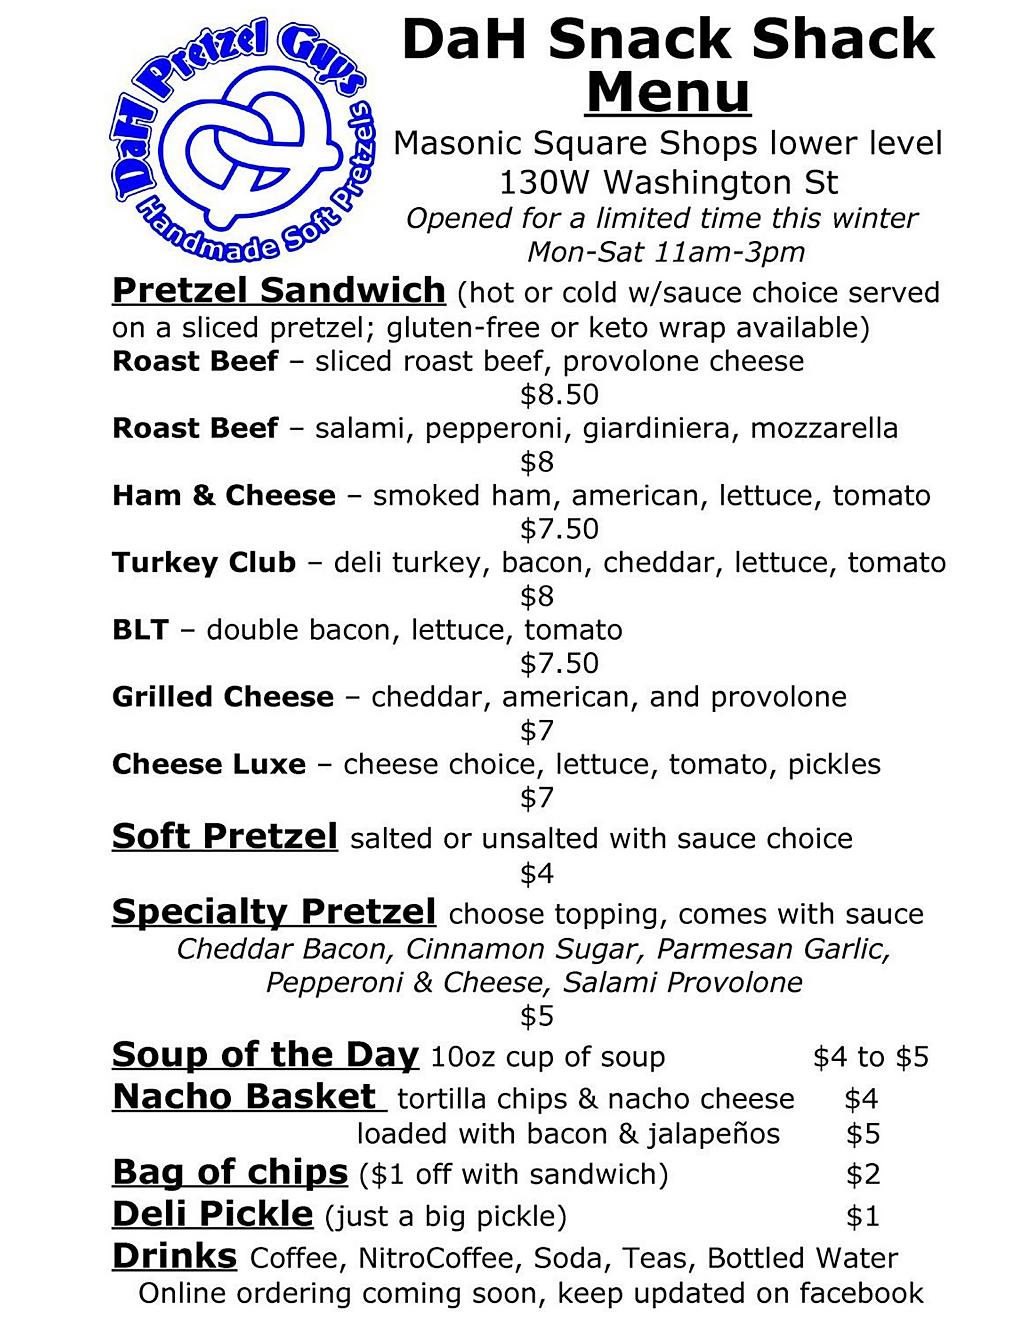 Dah Pretzel Guys restaurant menu happy hour hours food trucks location deals Marquette Now